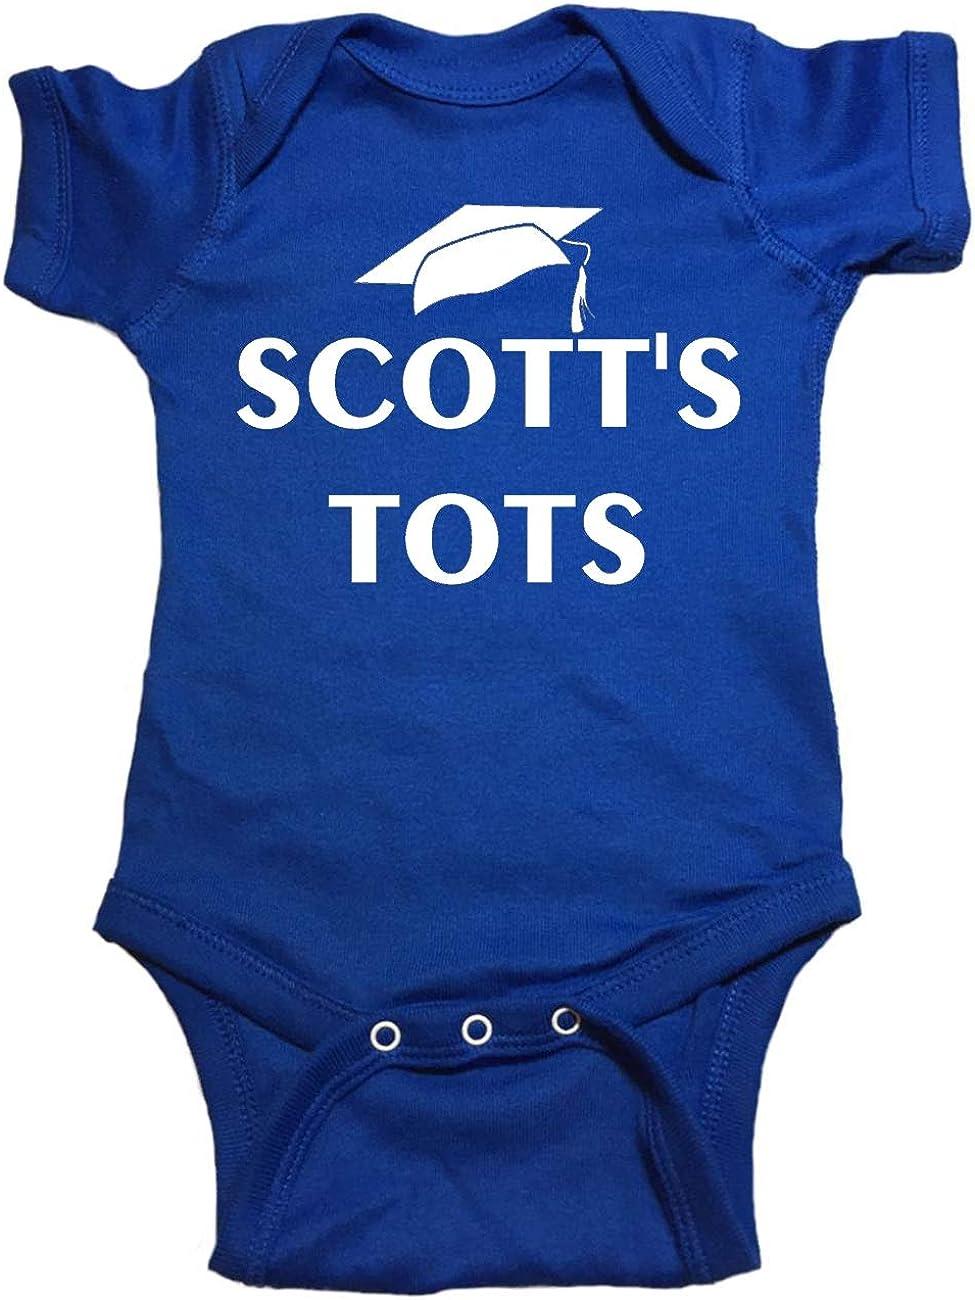 The Office Baby Clothes Scott's Tots Bodysuit Onesie